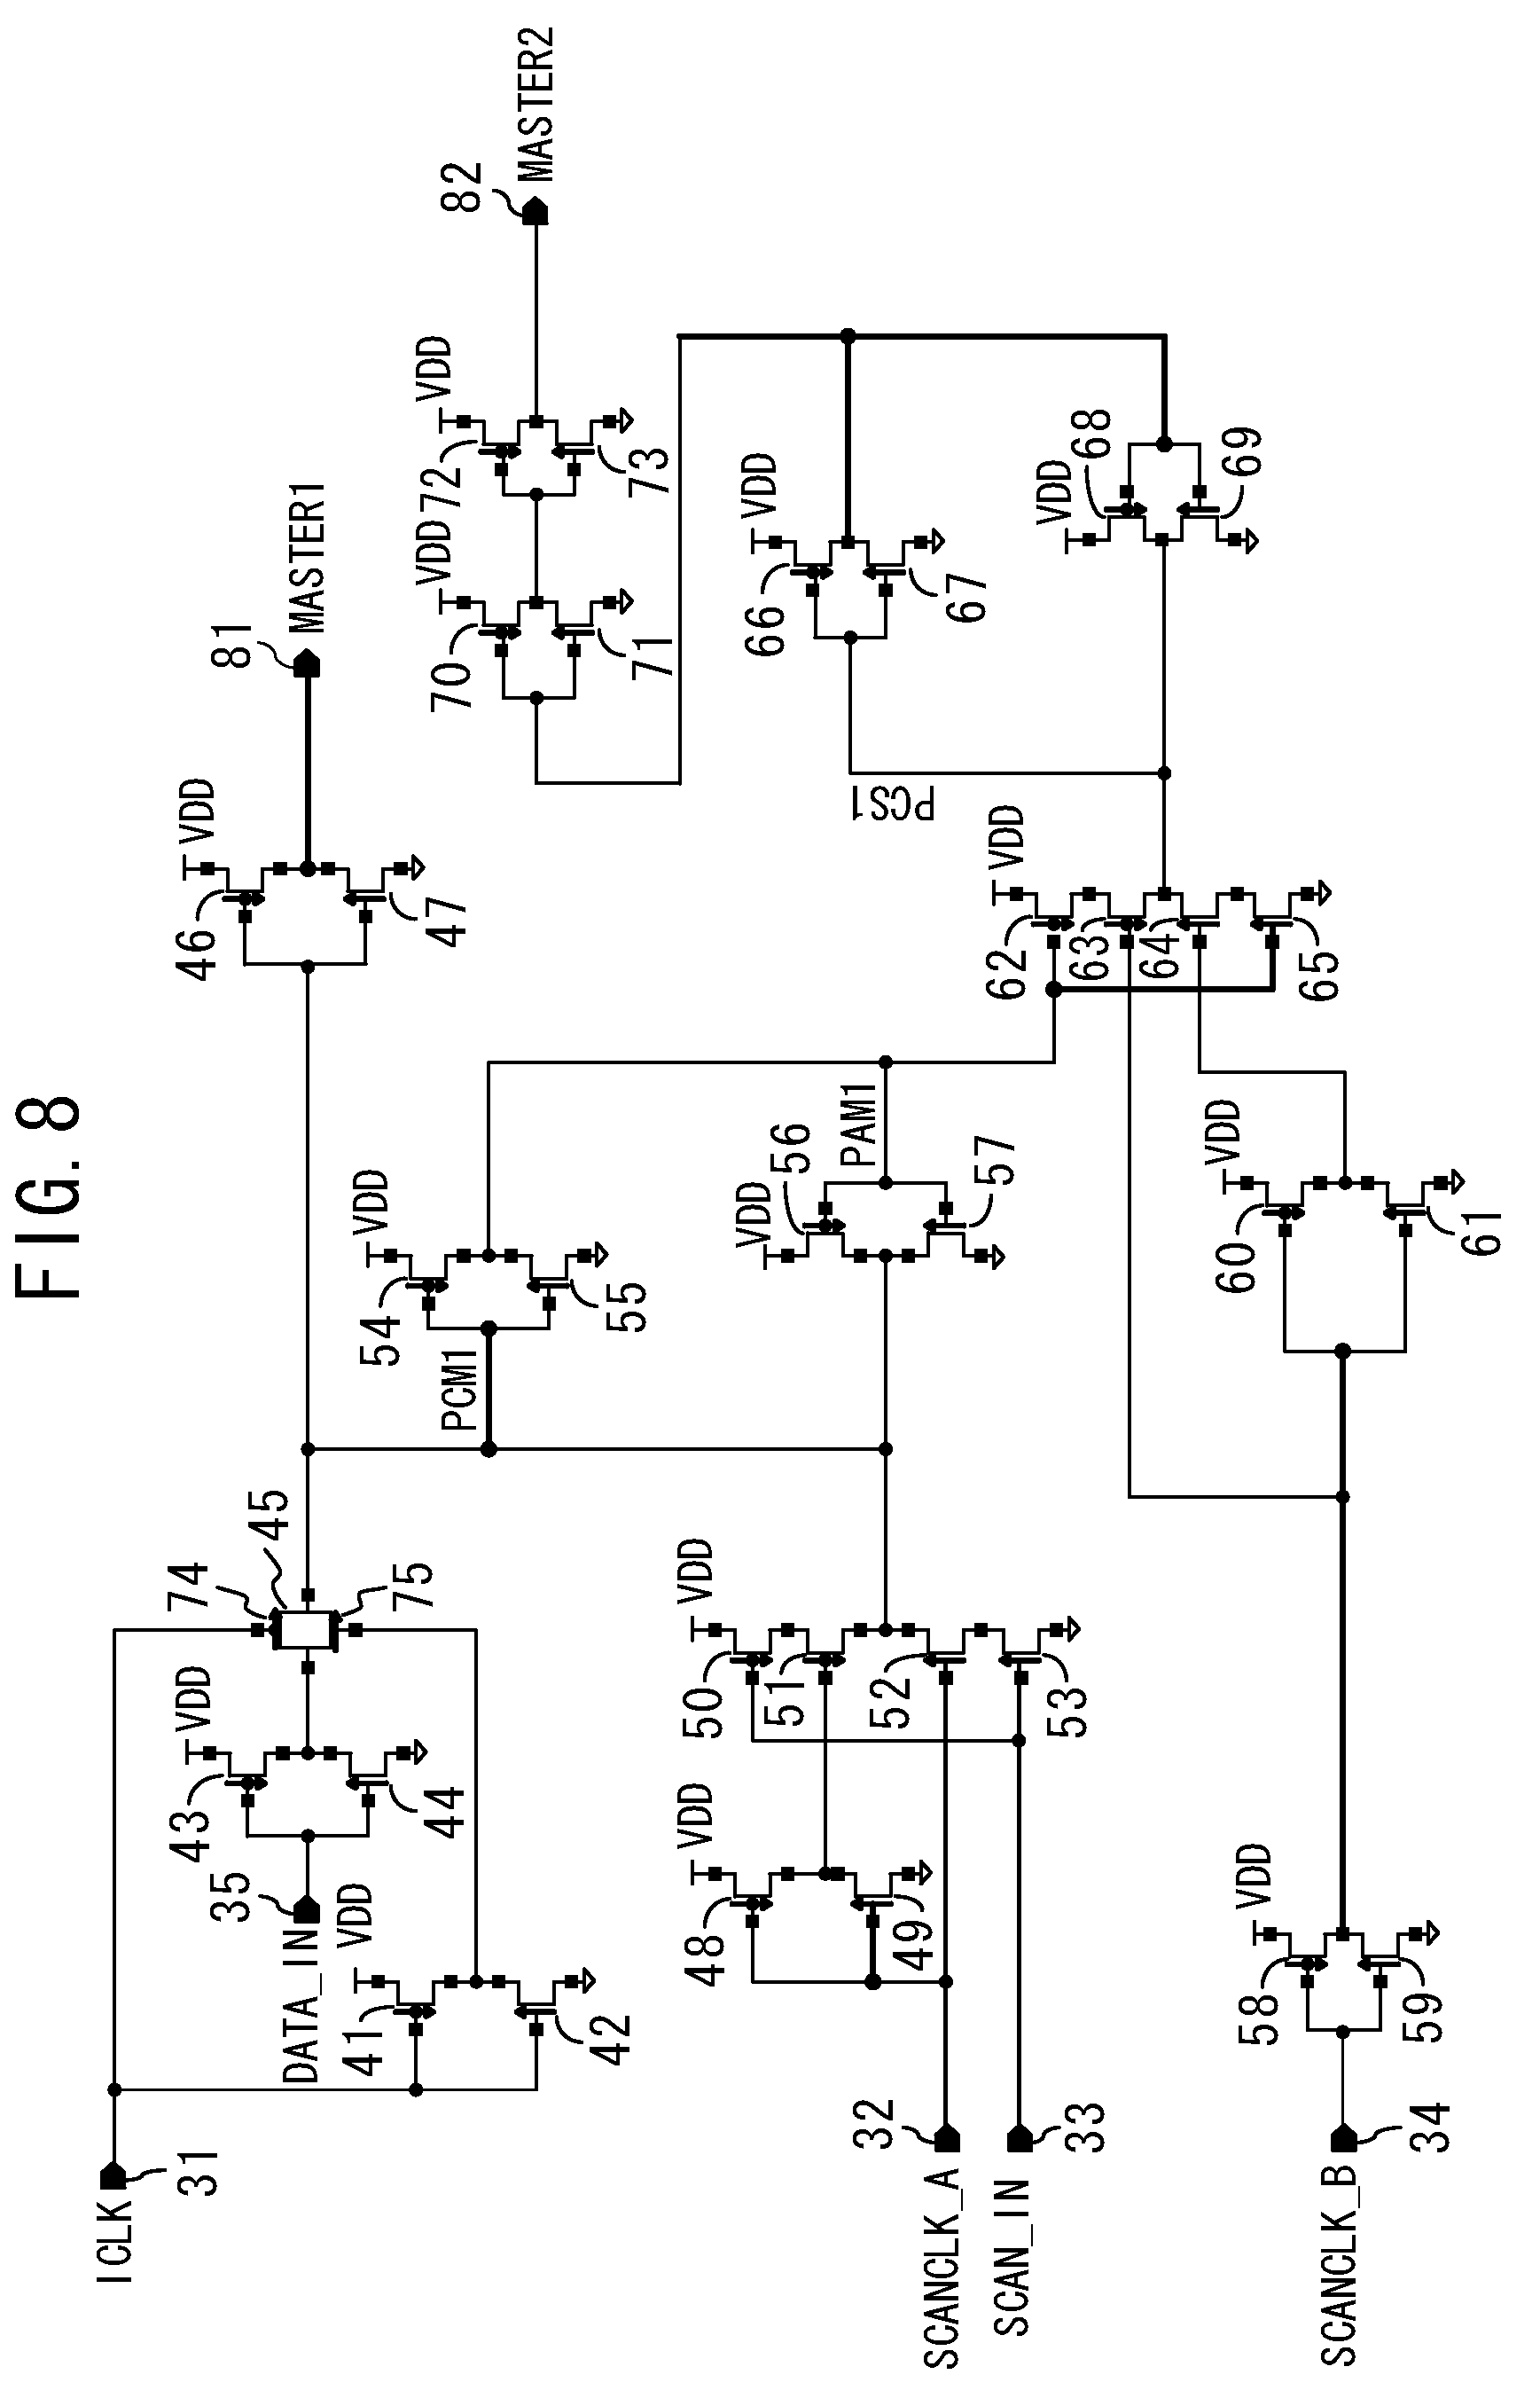 Latching Circuit Diagram, Latching, Free Engine Image For